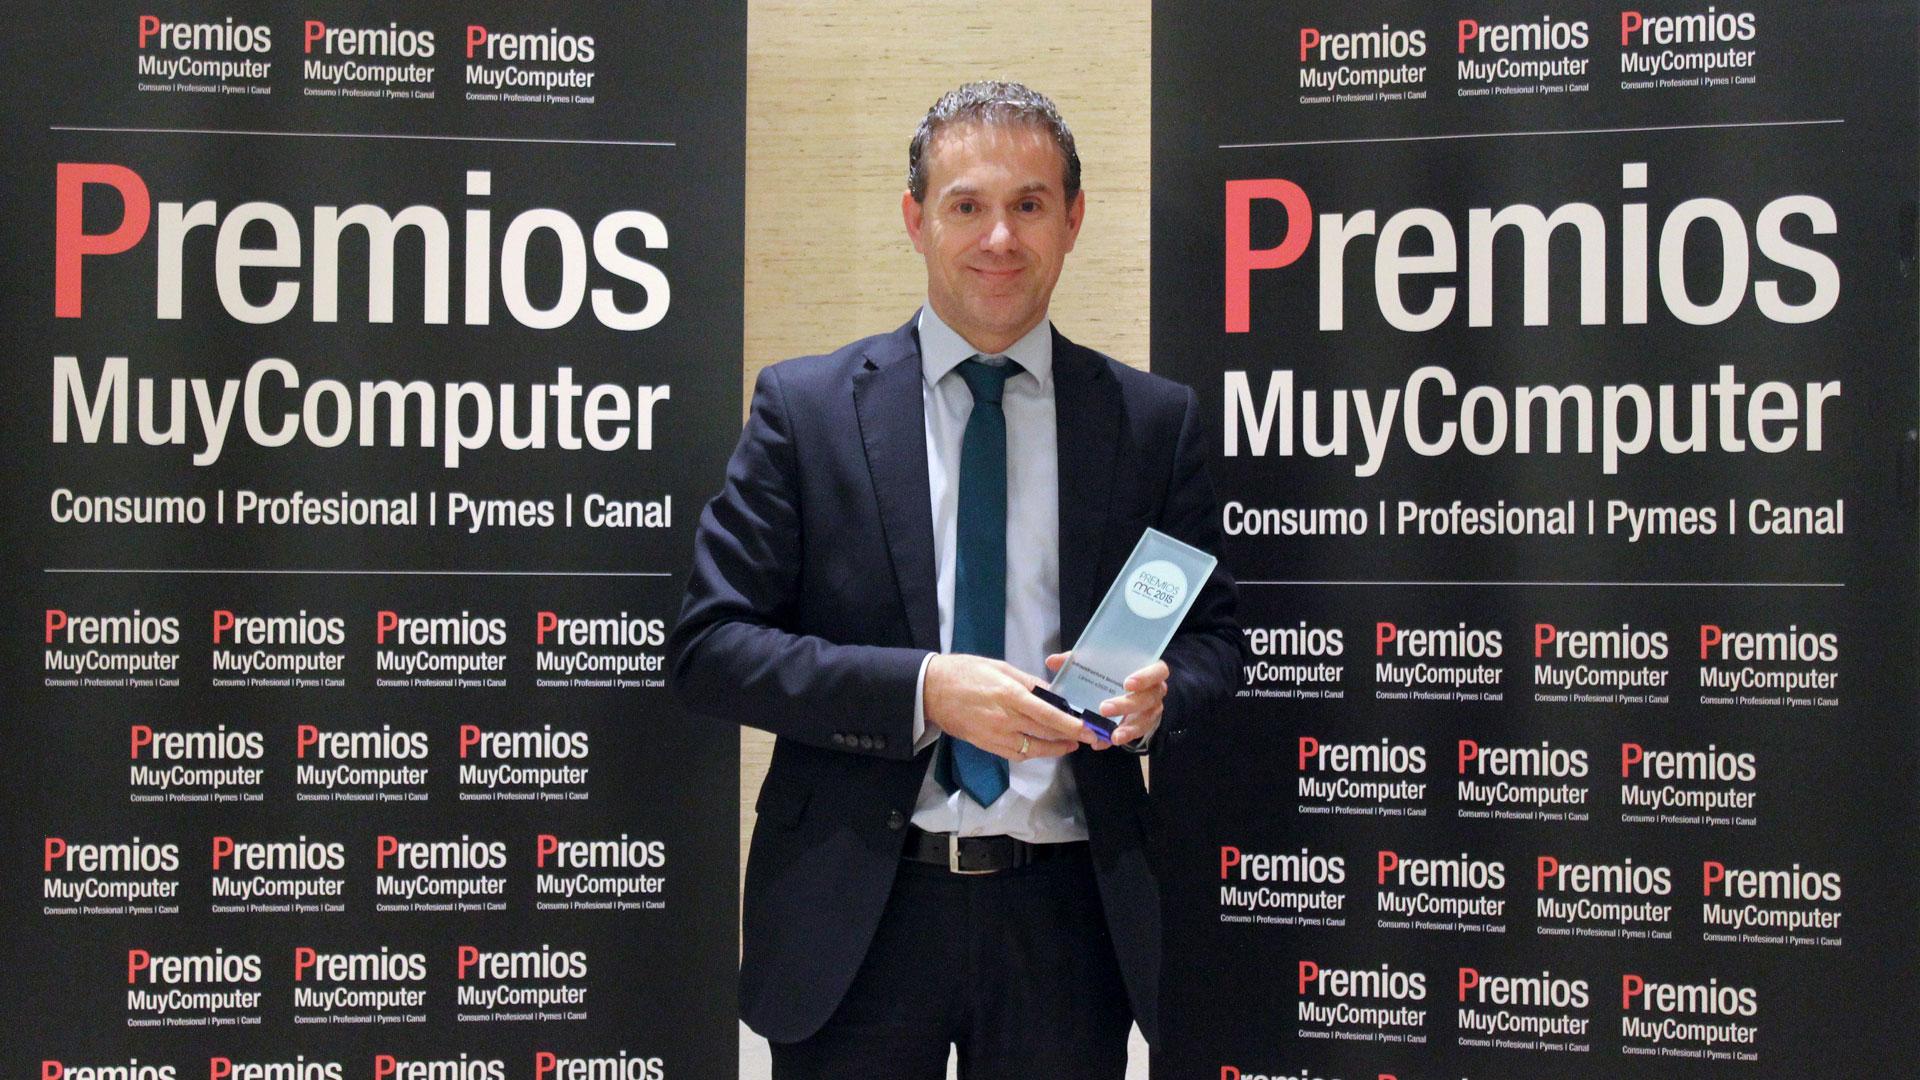 premios-mc2015-lenovo-x3500-M5-infraestructura-tecnologica